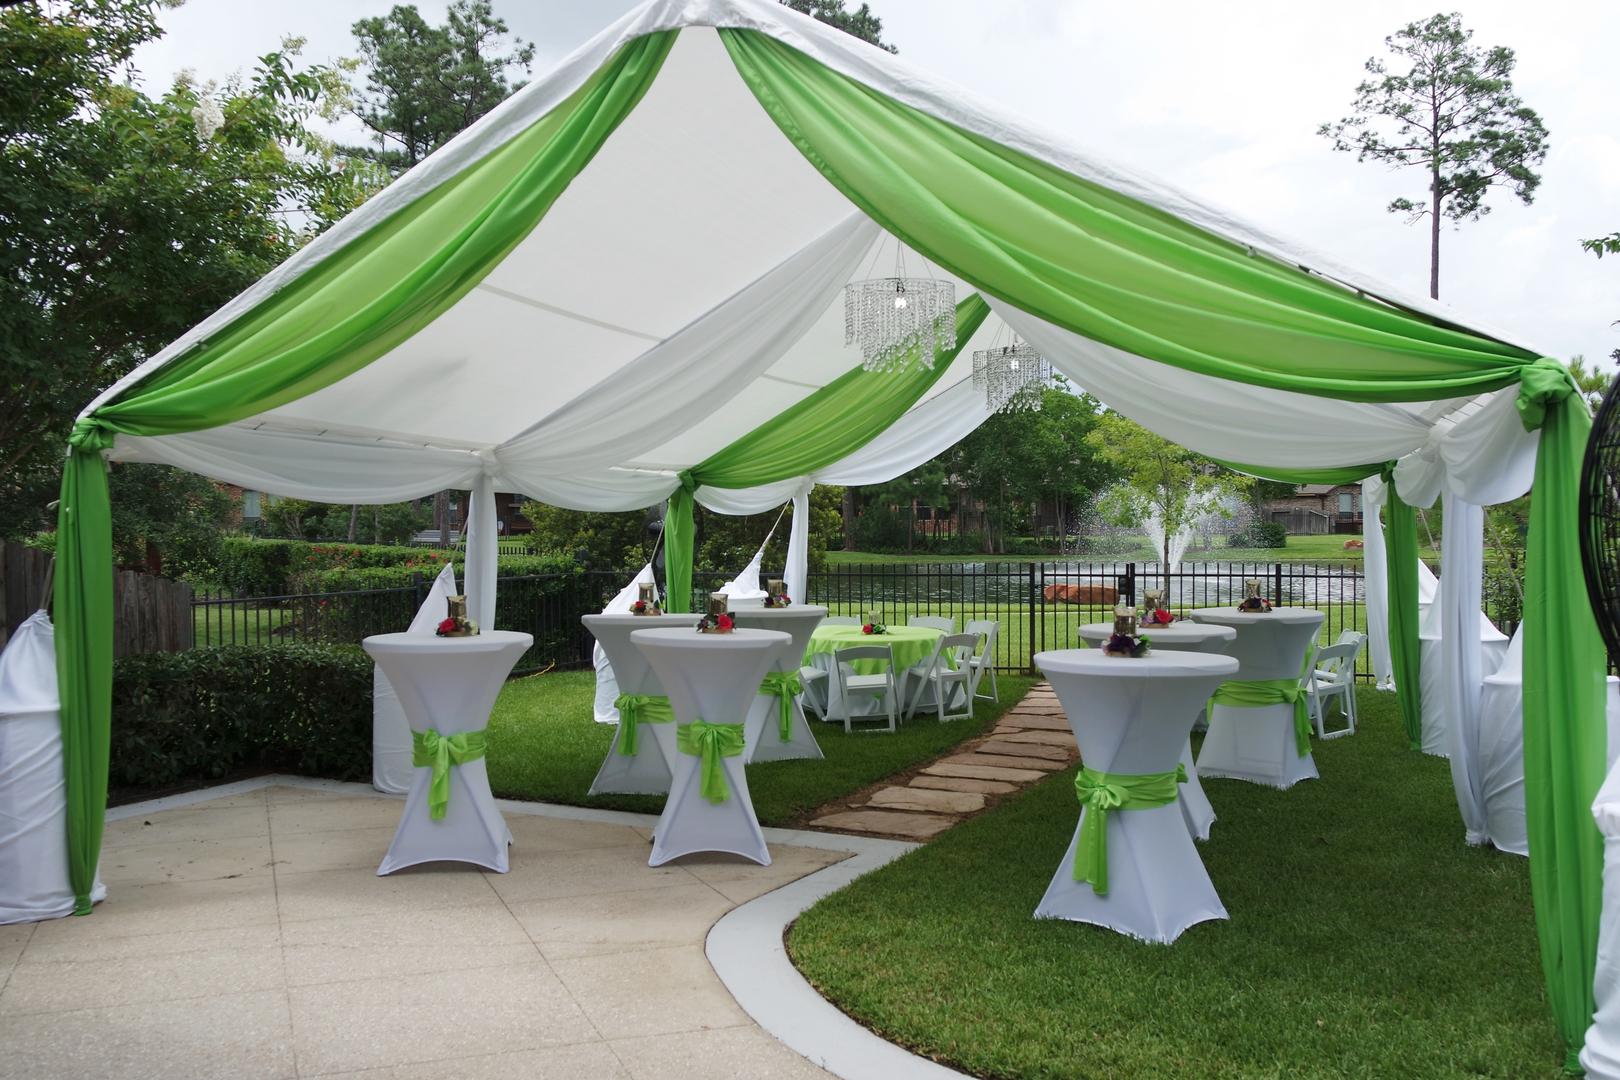 event decorations | decorating ideas